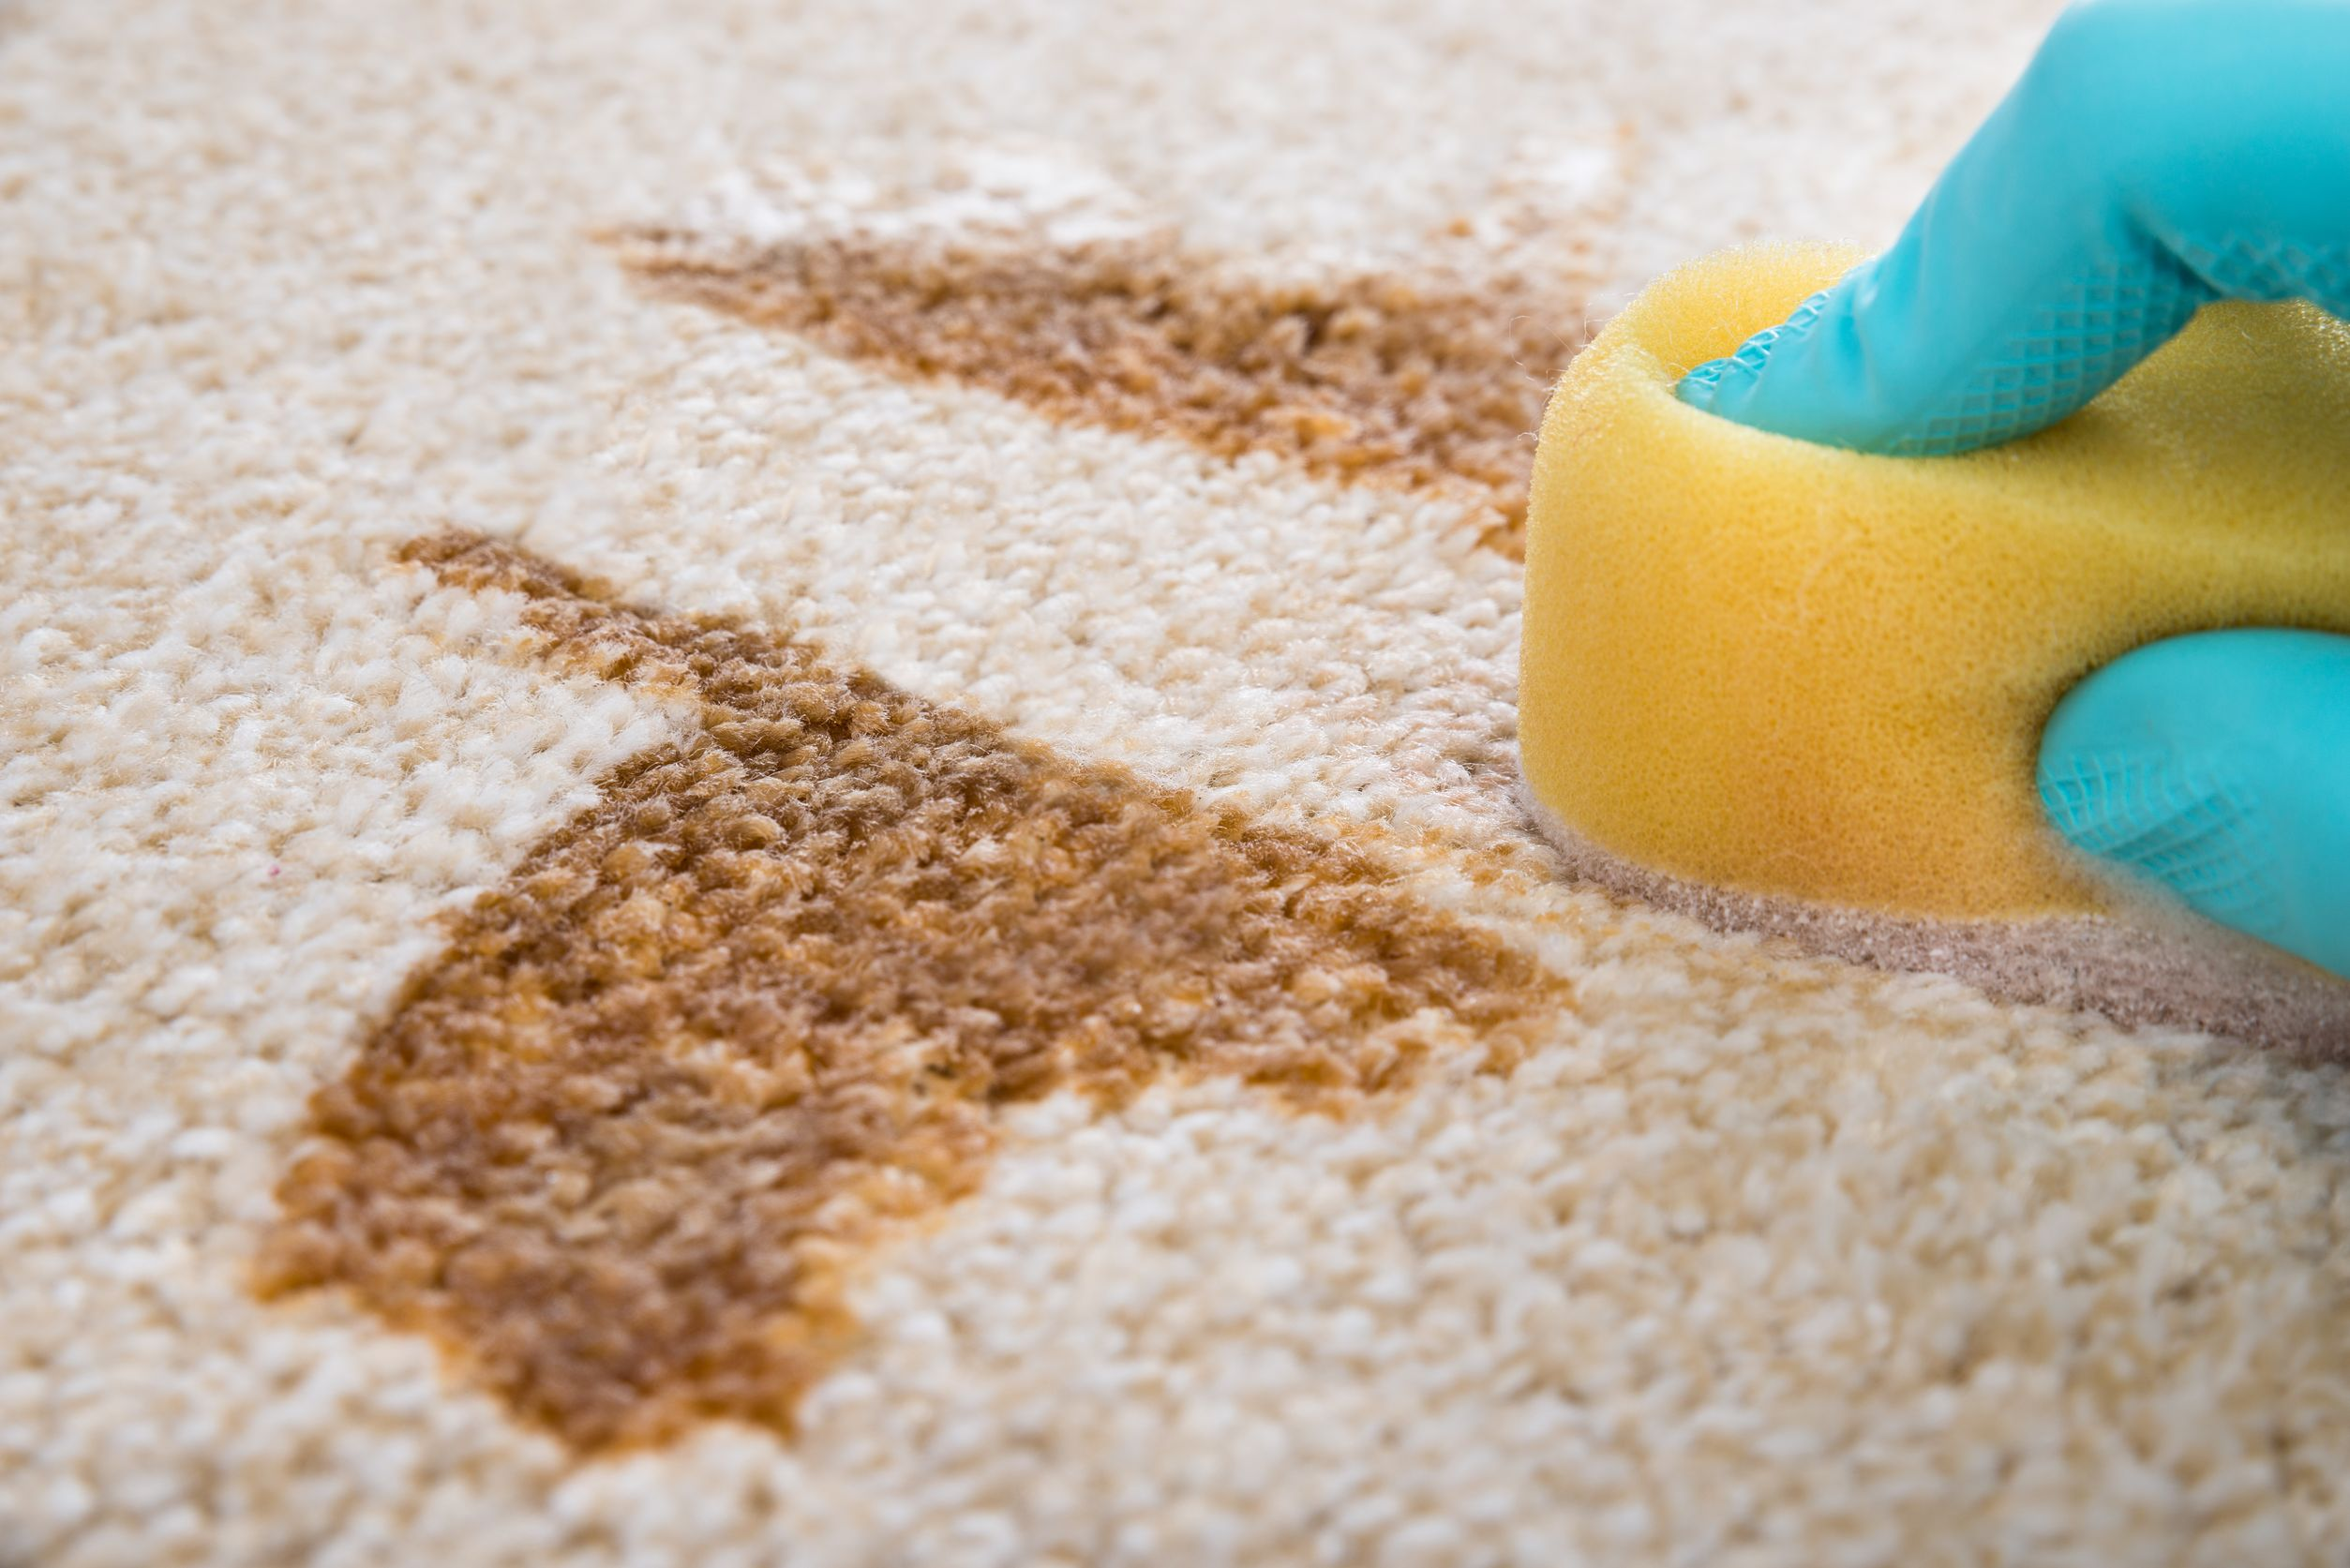 čistírna koberců praha 7